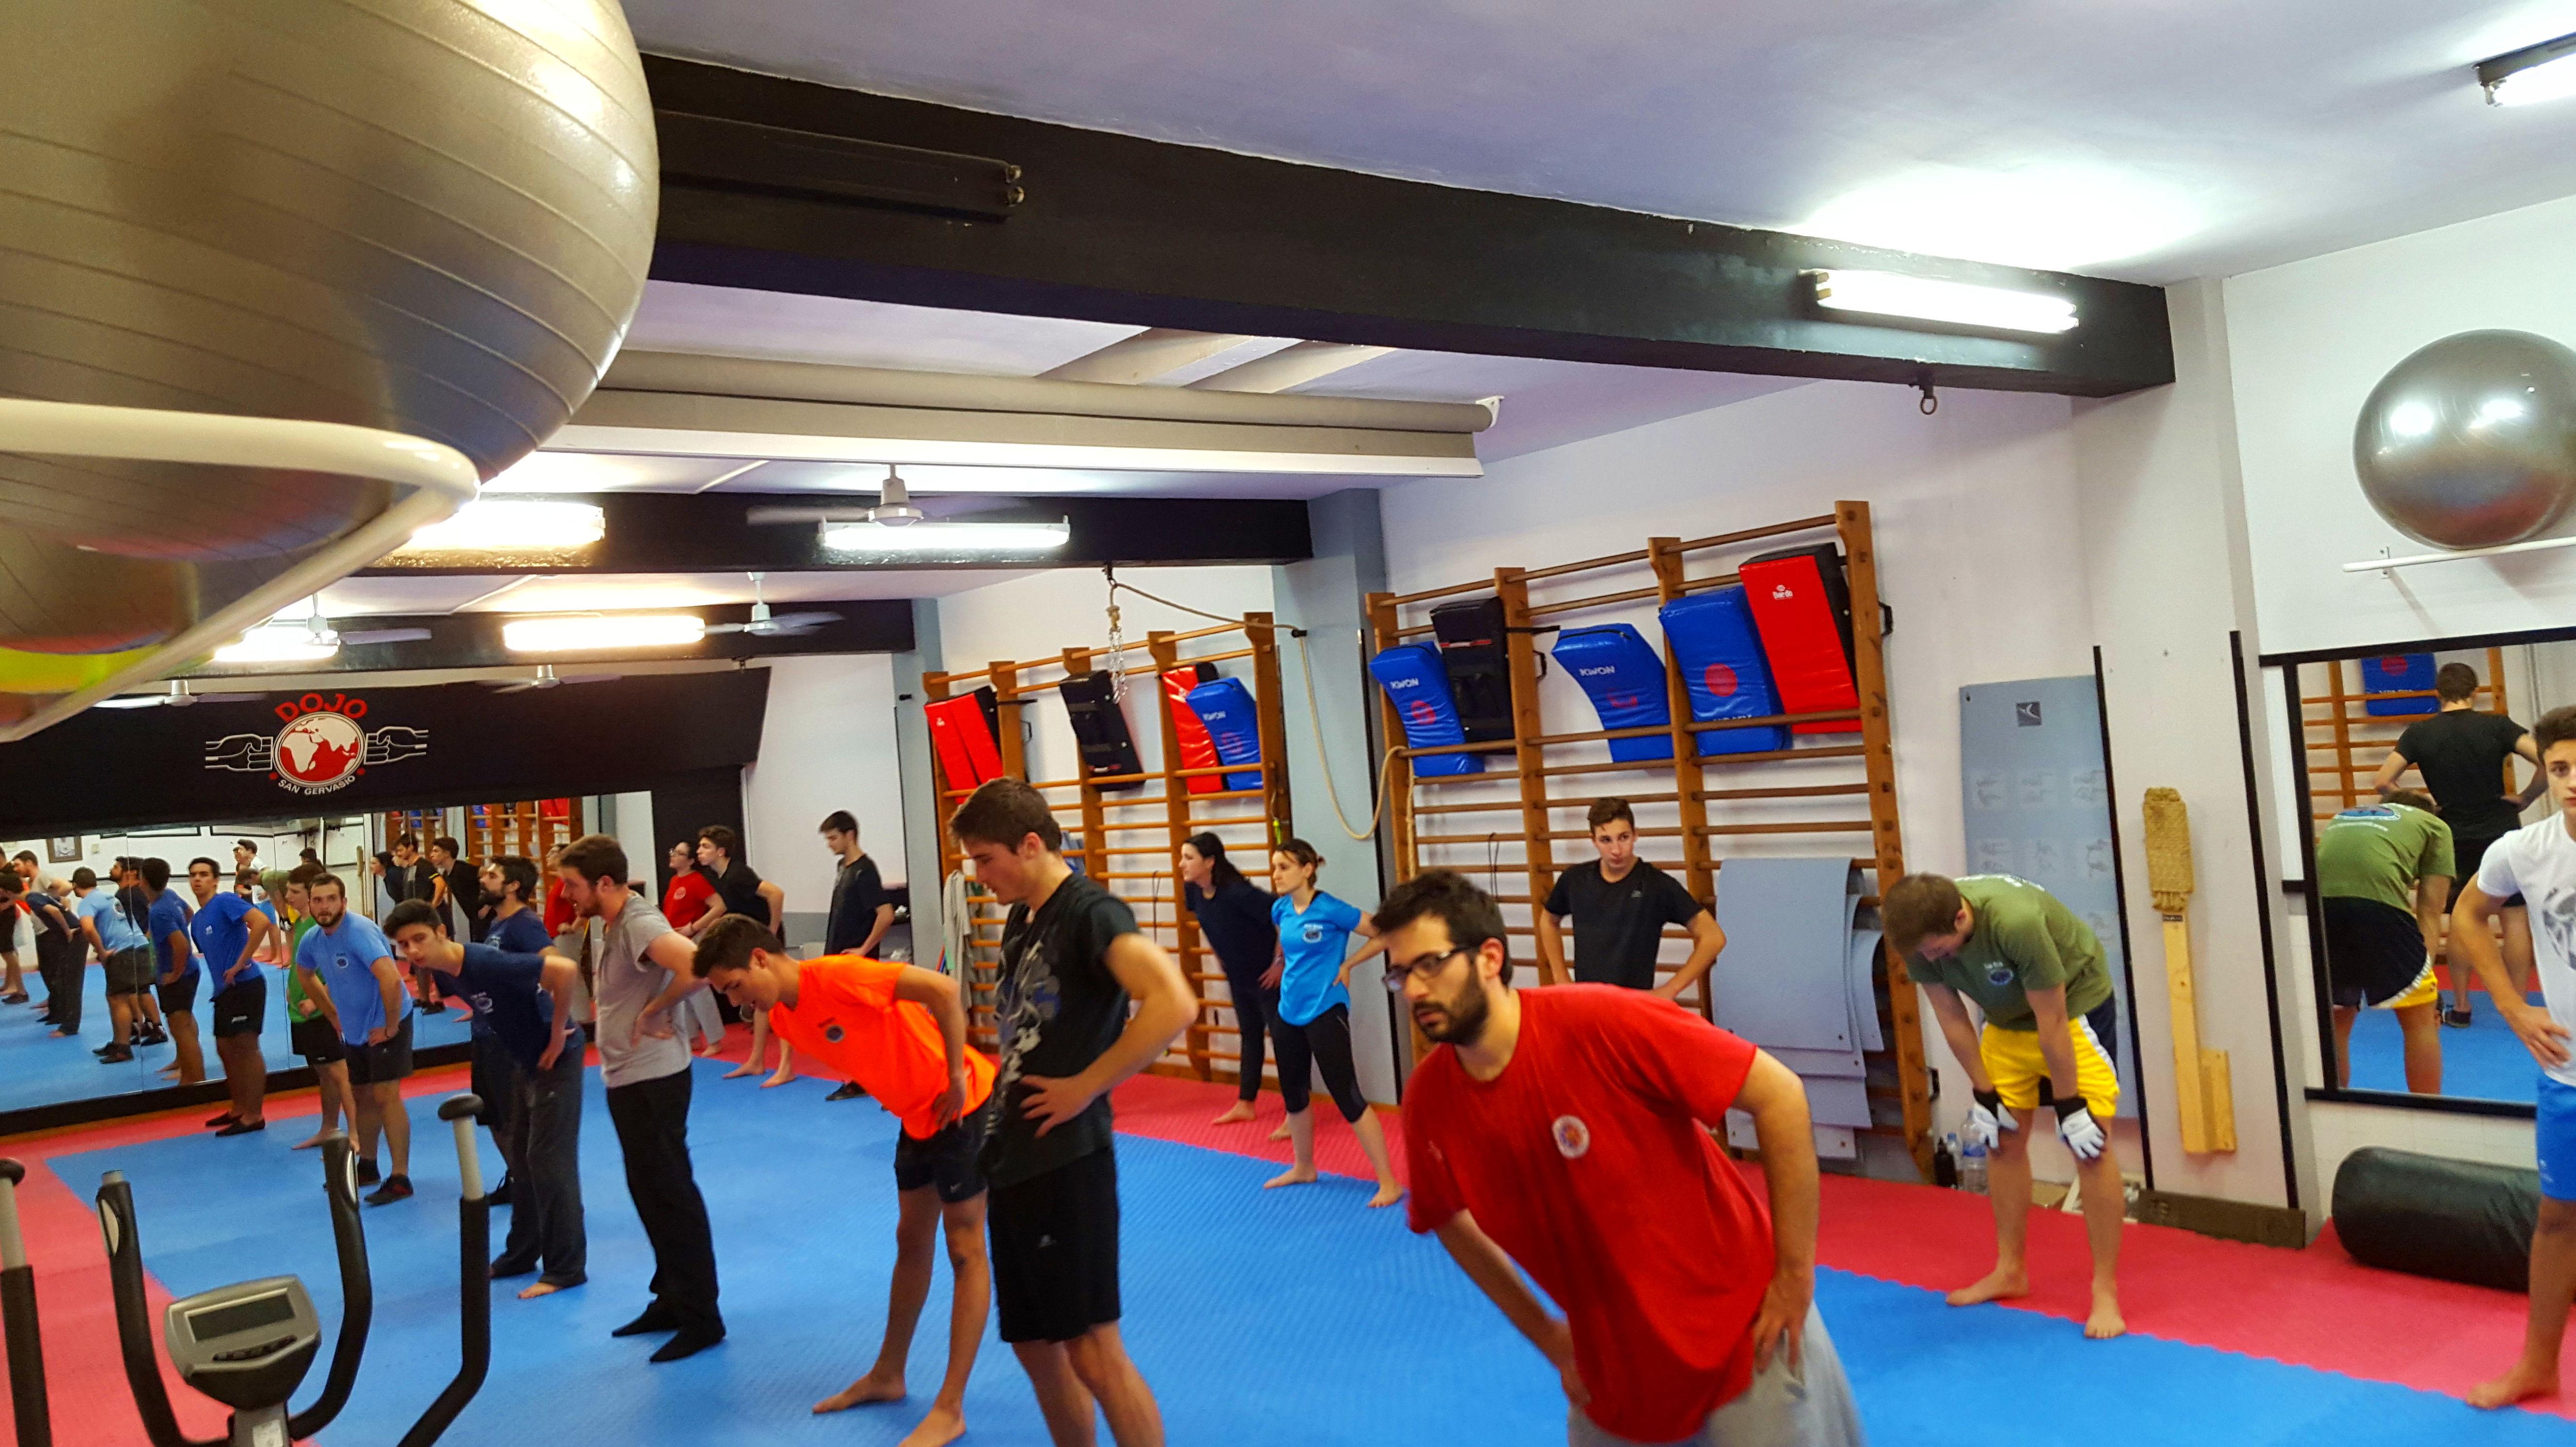 Foto 8 de Clases deportivas en Barcelona | Dojo Sant Gervasi